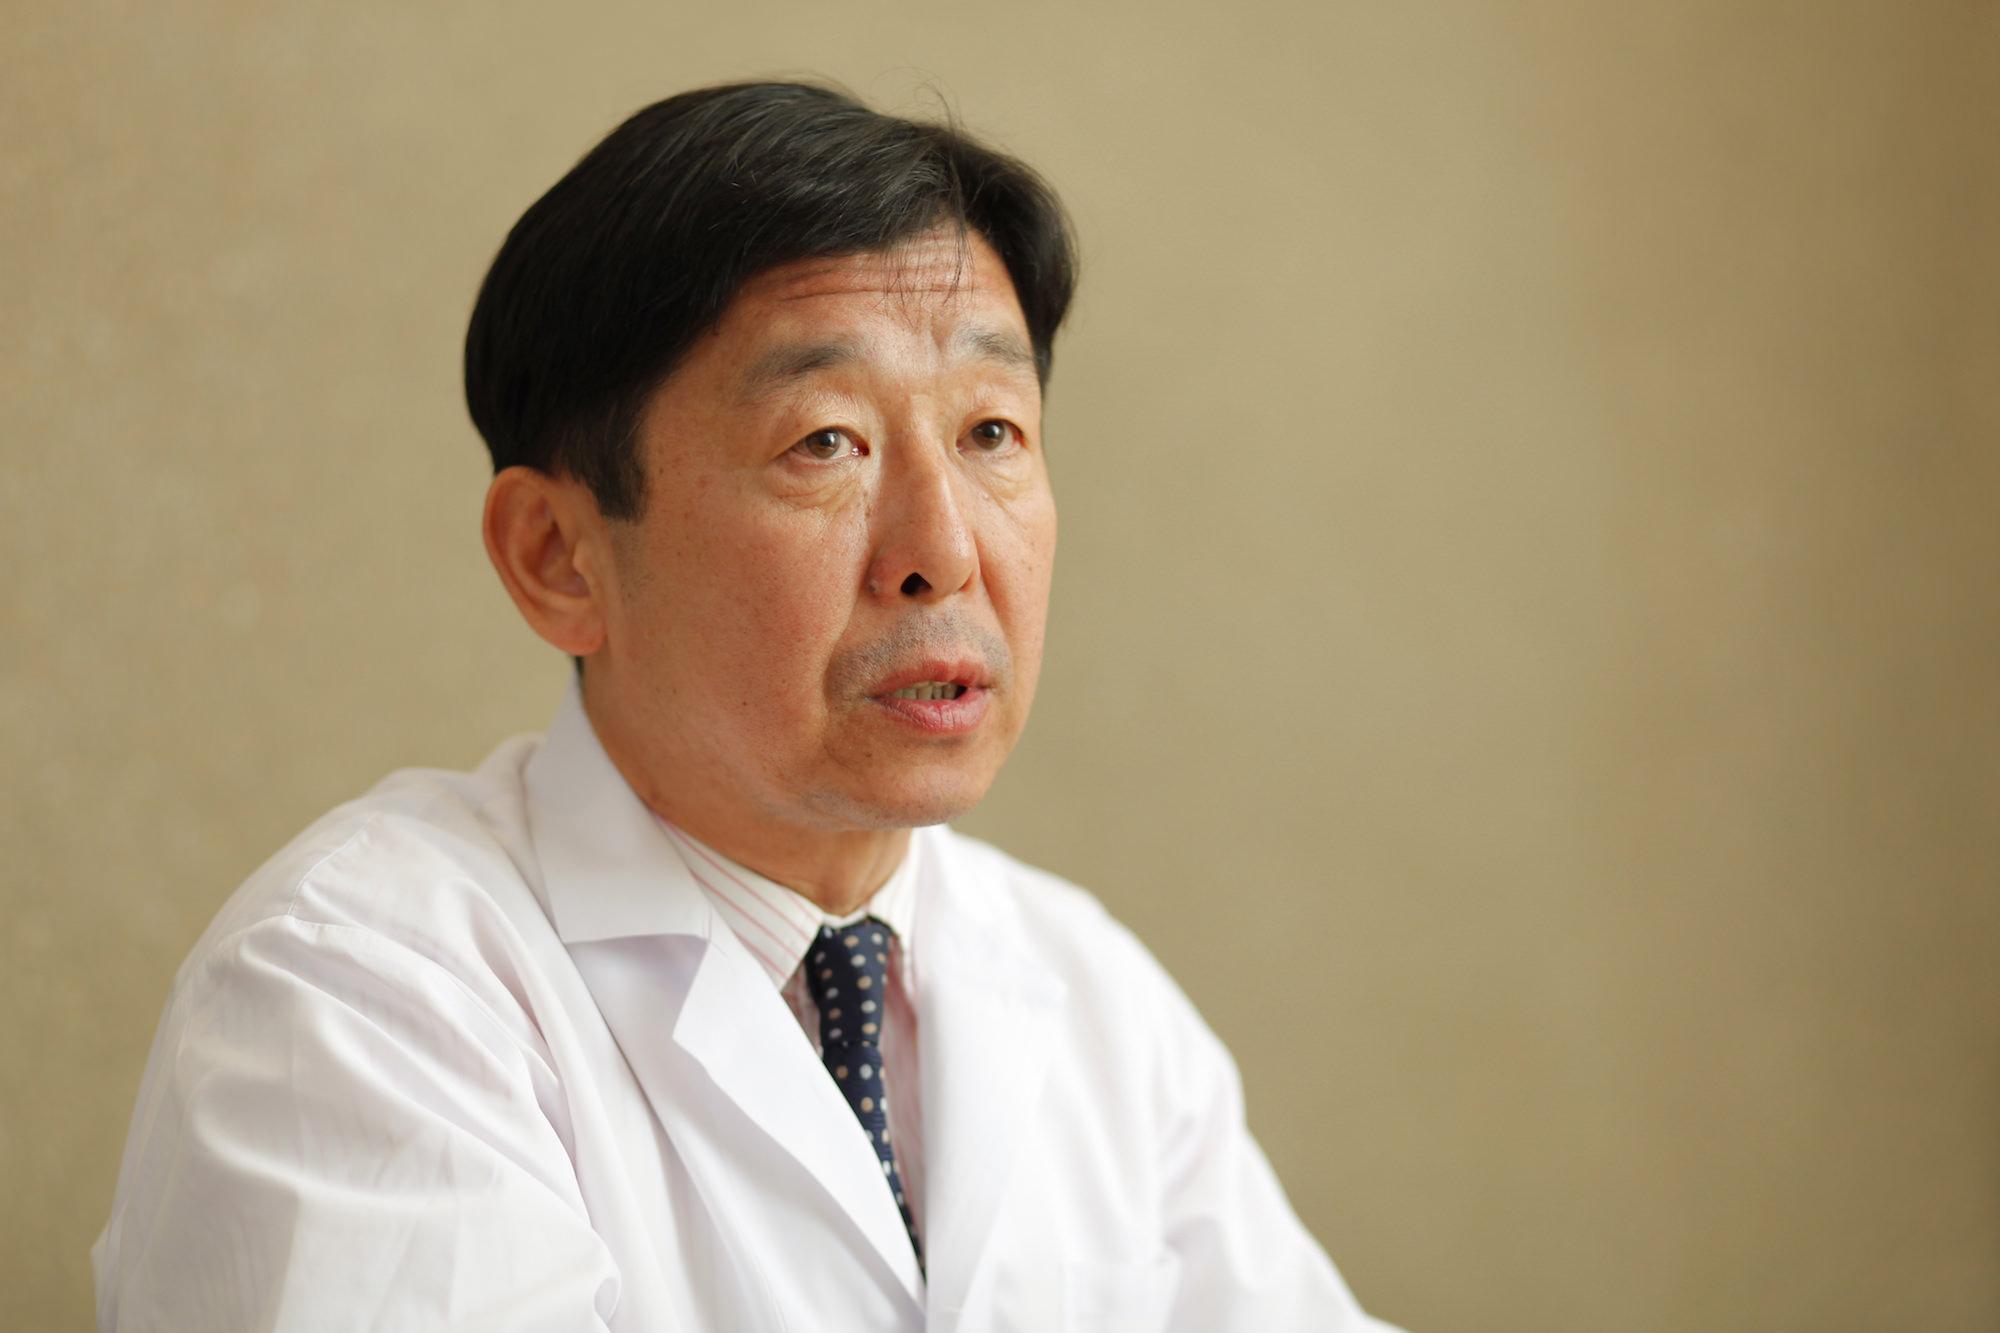 Makimura Akio Makimura